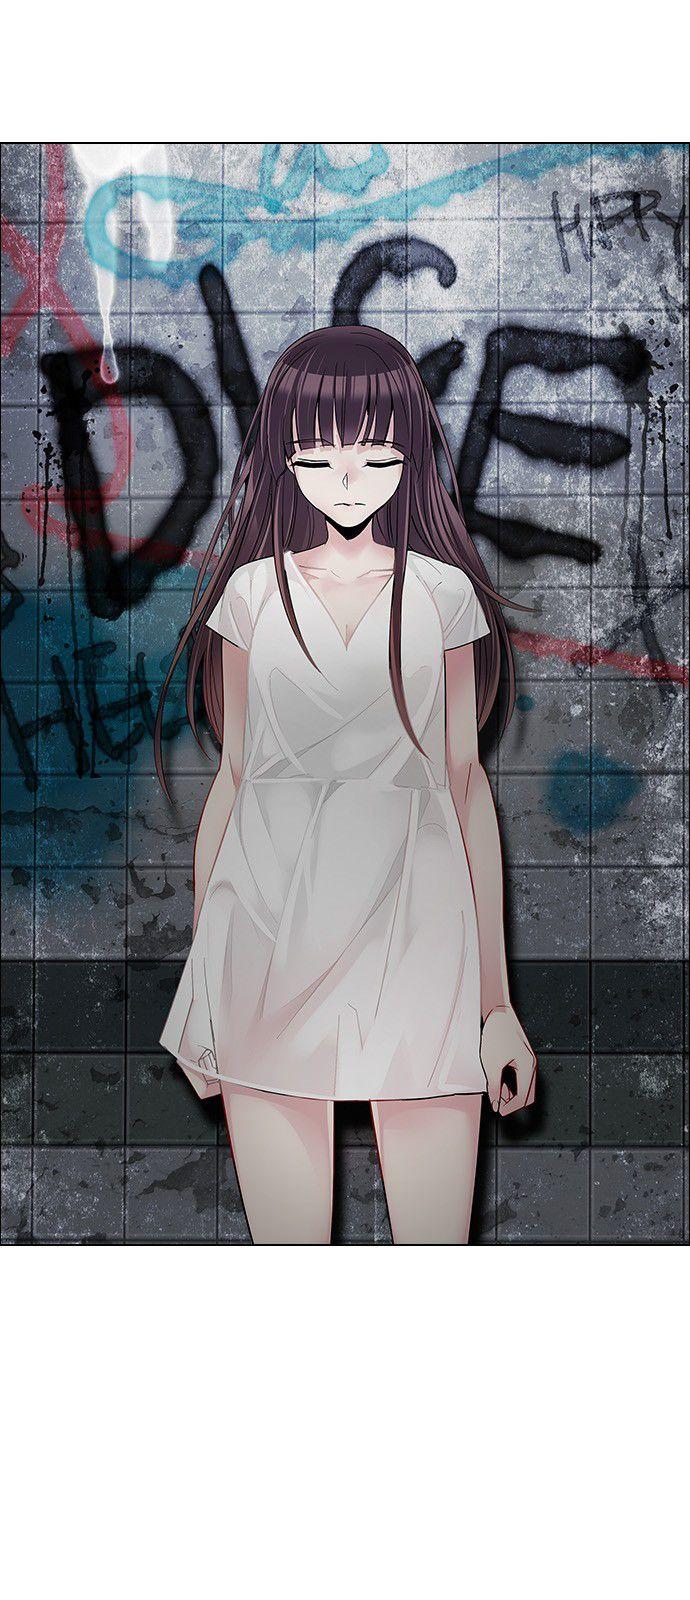 Pin oleh Dustardlyhoplite di manga/manhua/manhwa Animasi